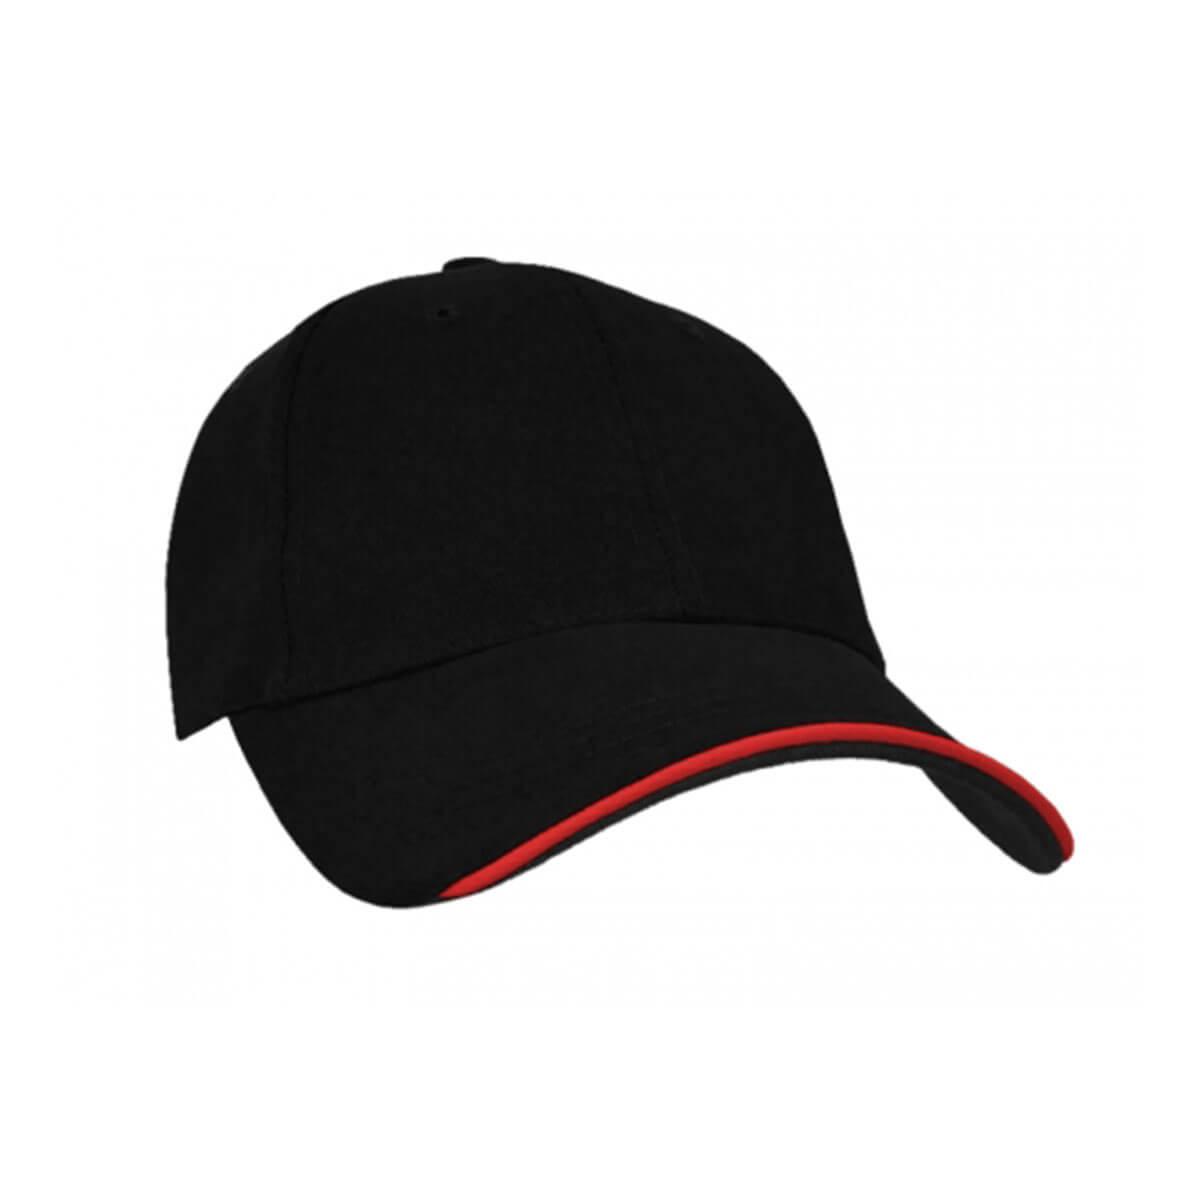 Navigator Cap-Black / Red / Black